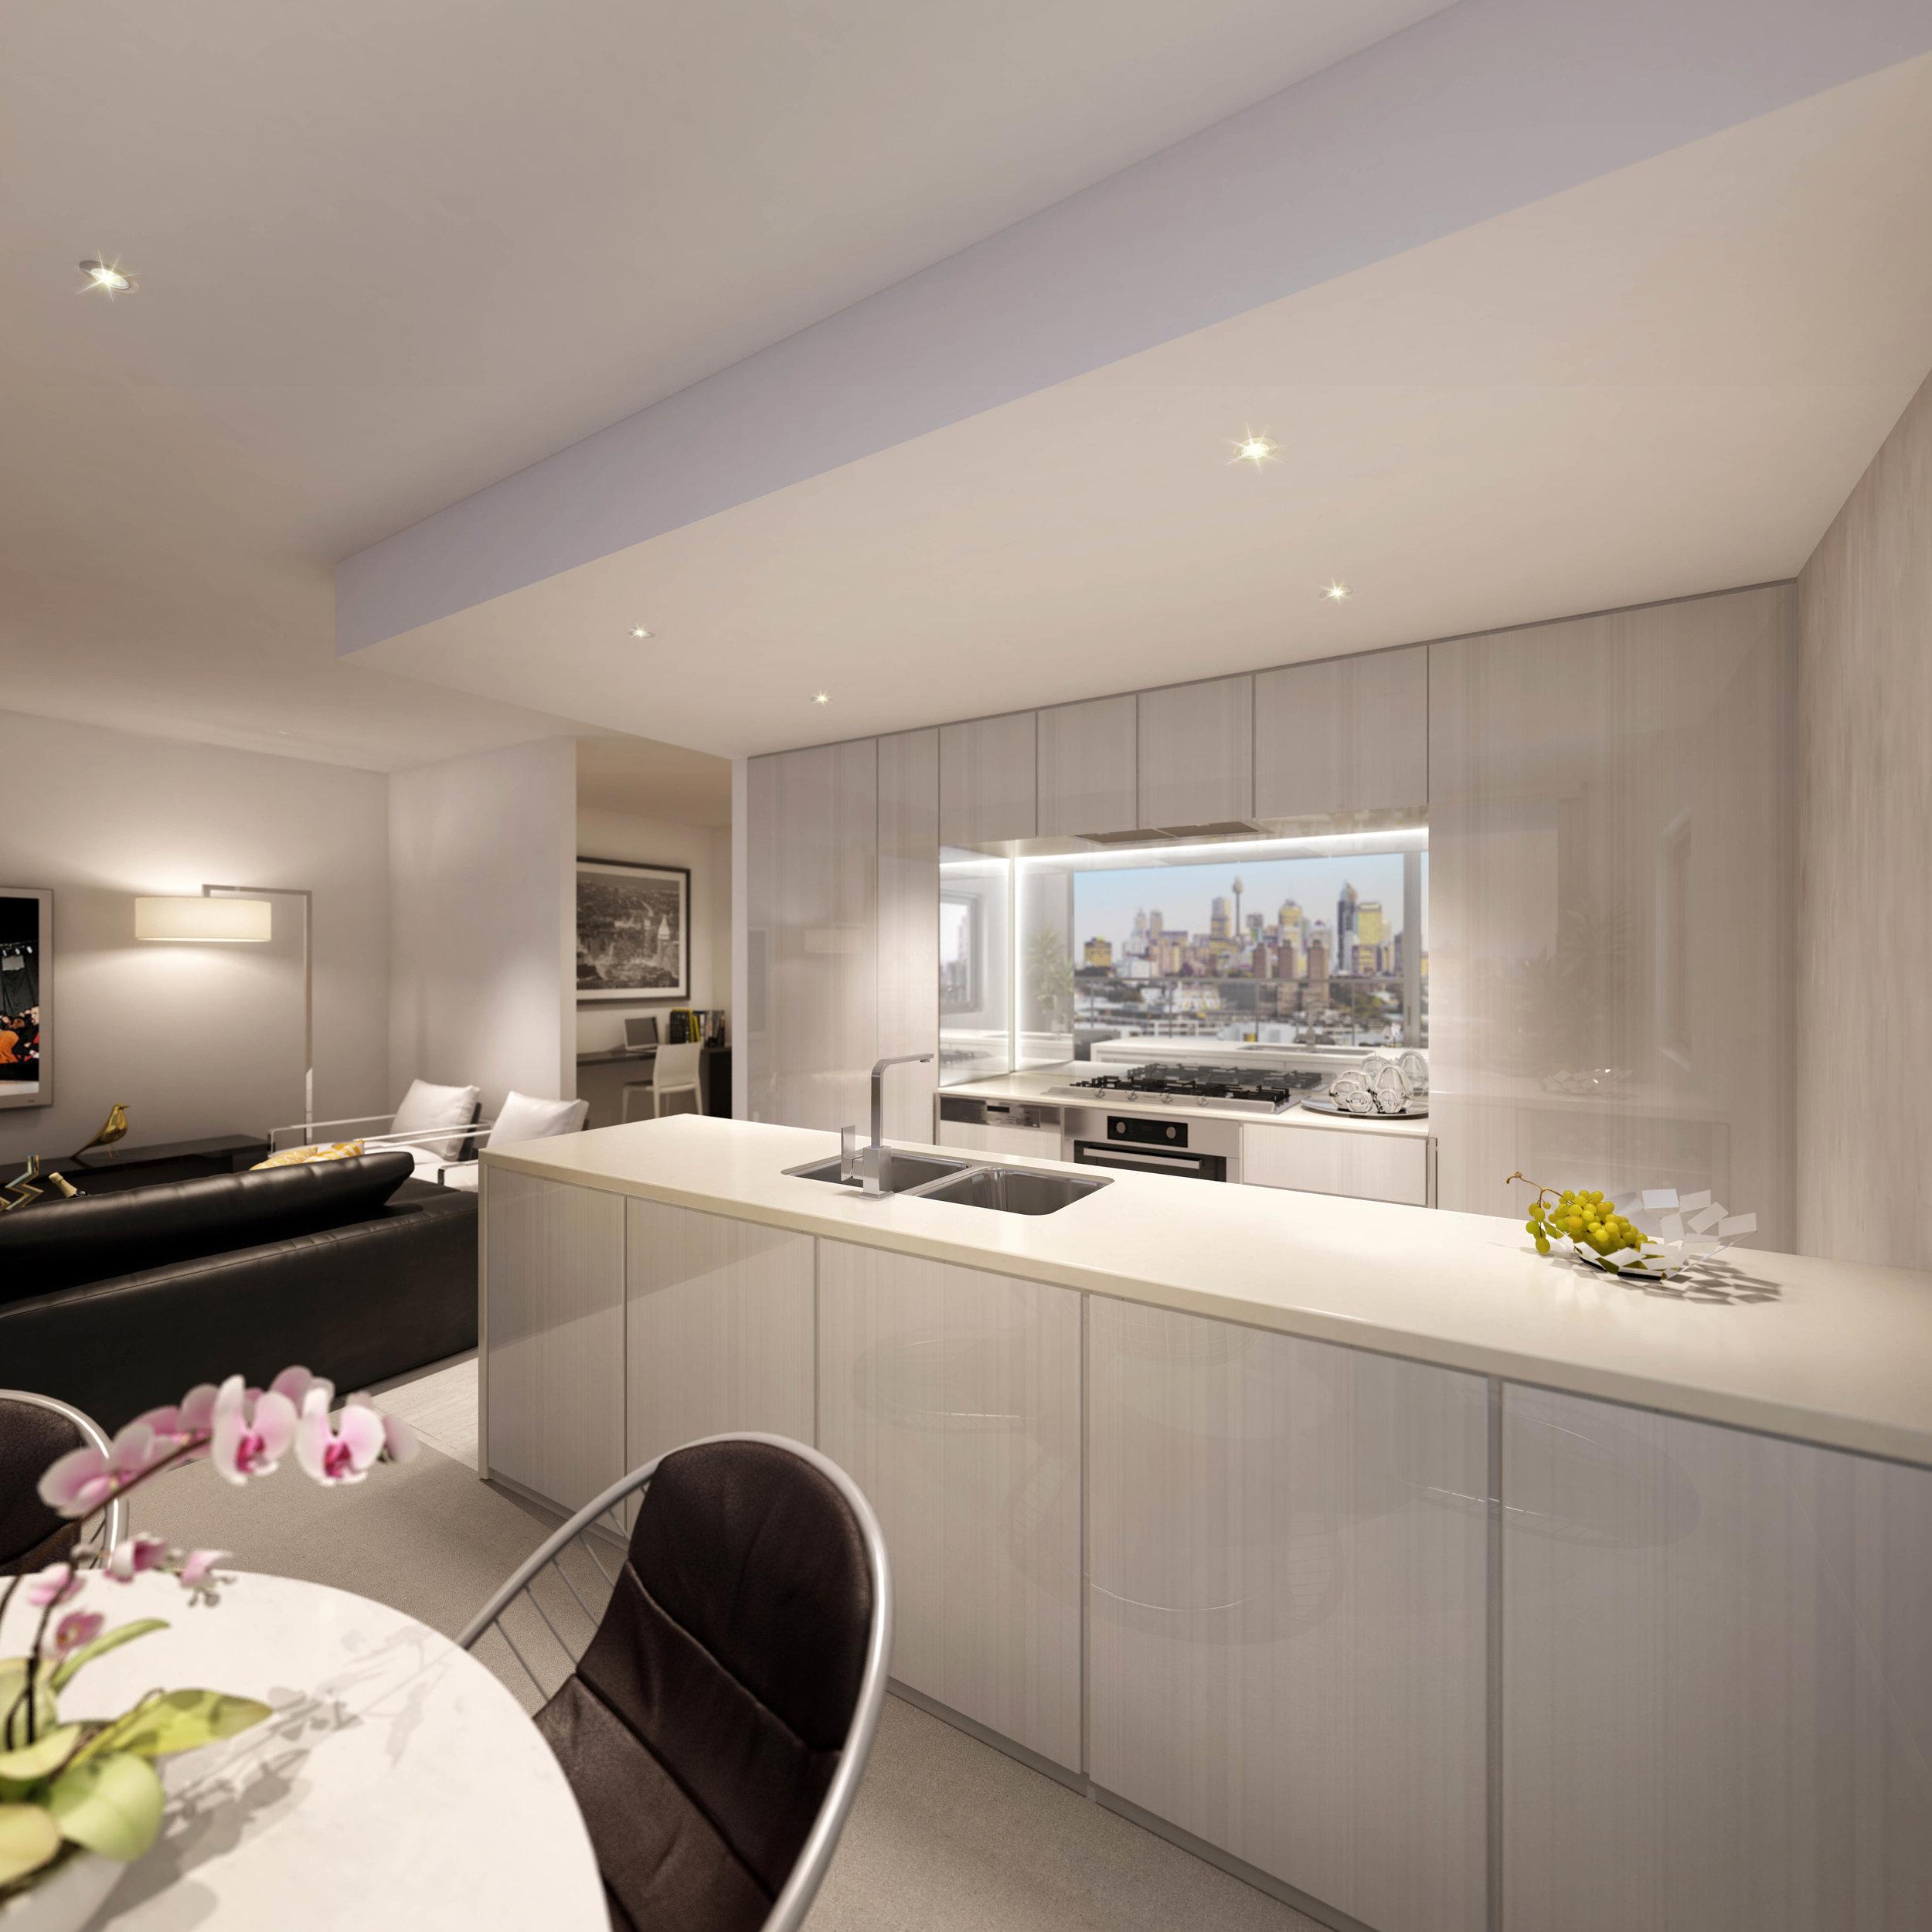 2 Bedroom - Kitchen 1 - Pearl.jpg